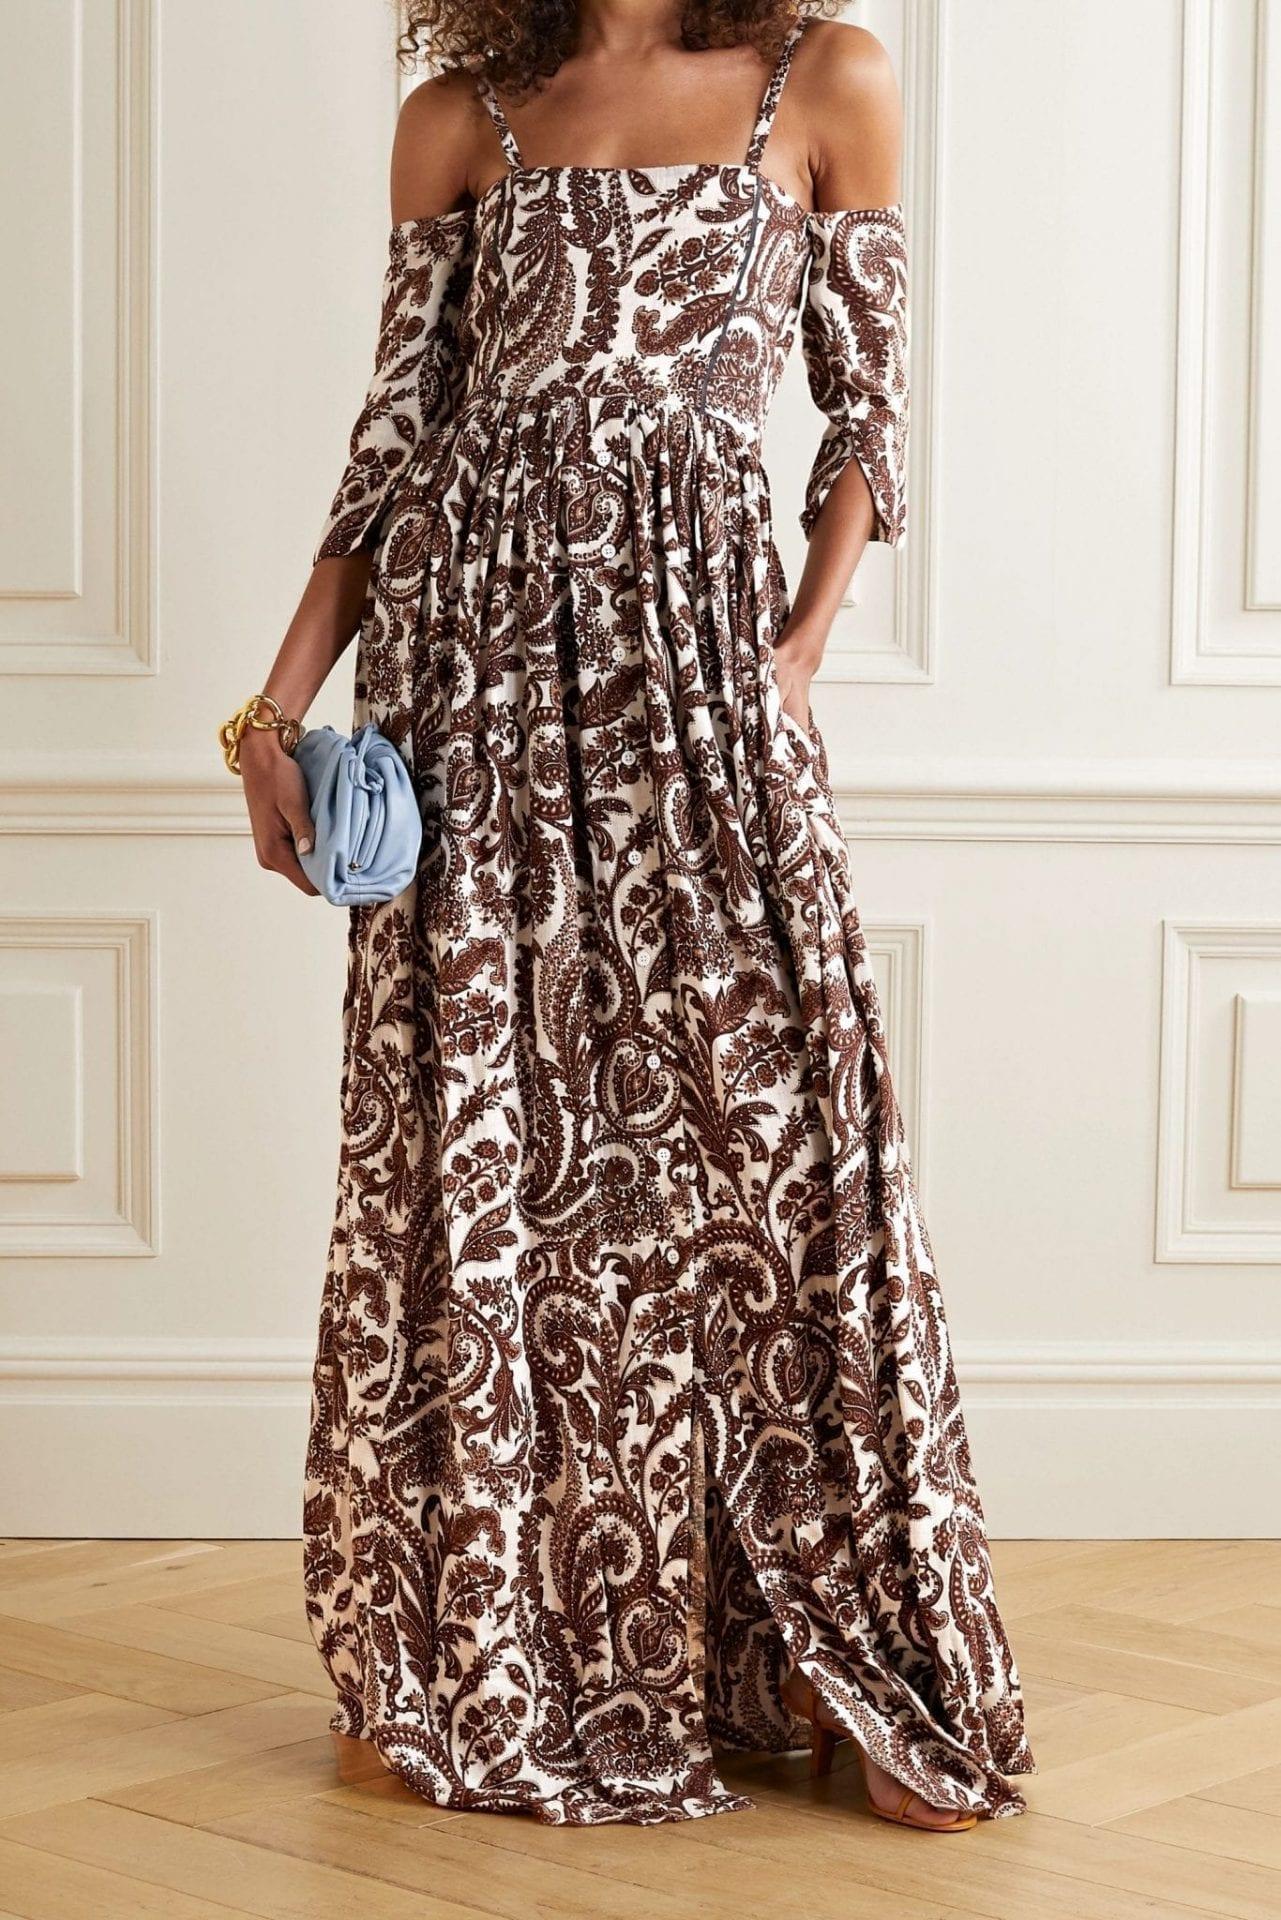 ROSIE ASSOULIN Cold-shoulder Paisley-print Linen Maxi Dress